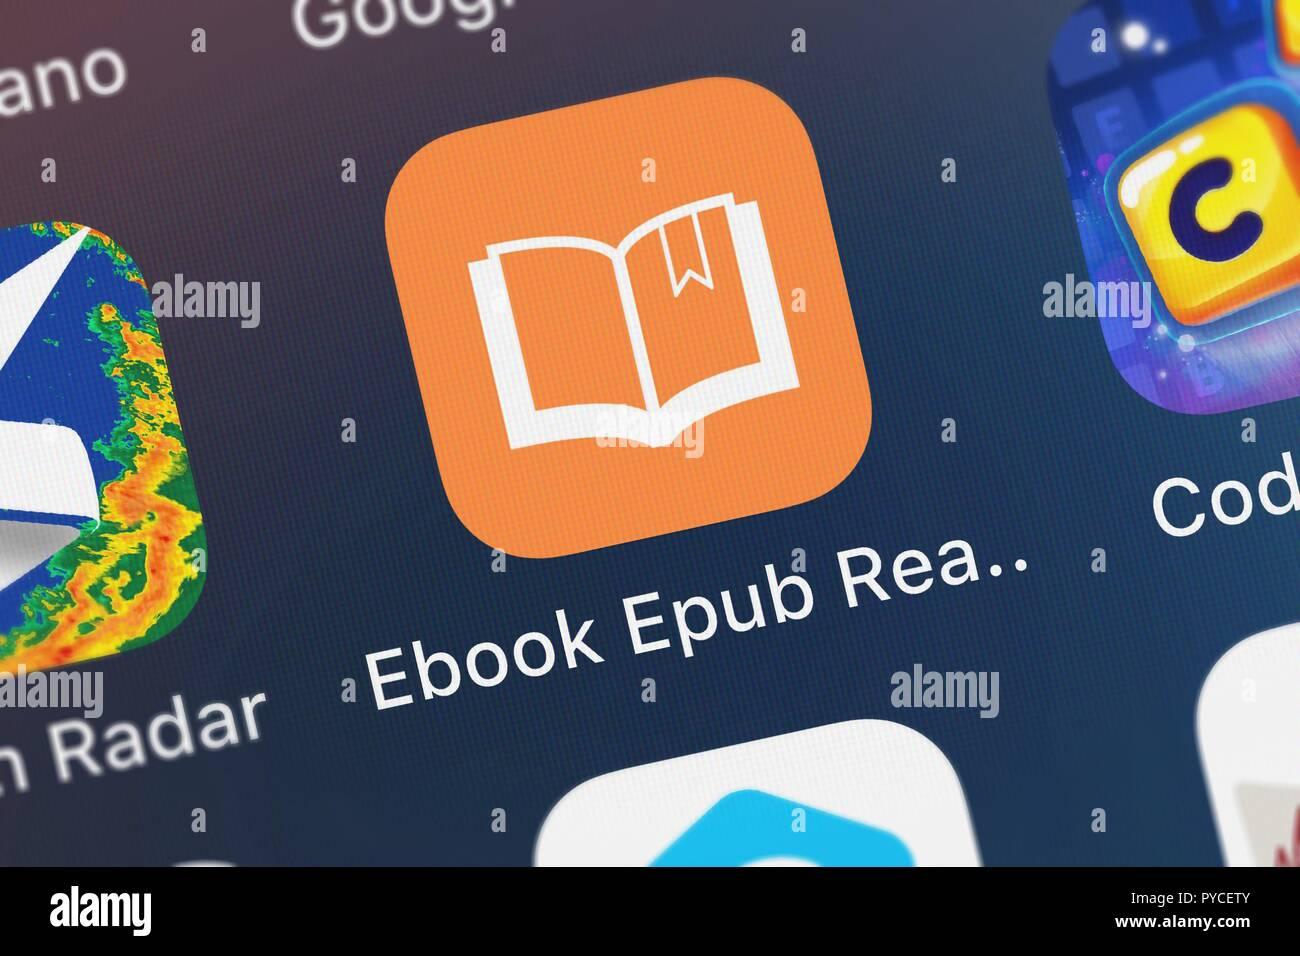 London United Kingdom October 26 2018 The Ebook Epub